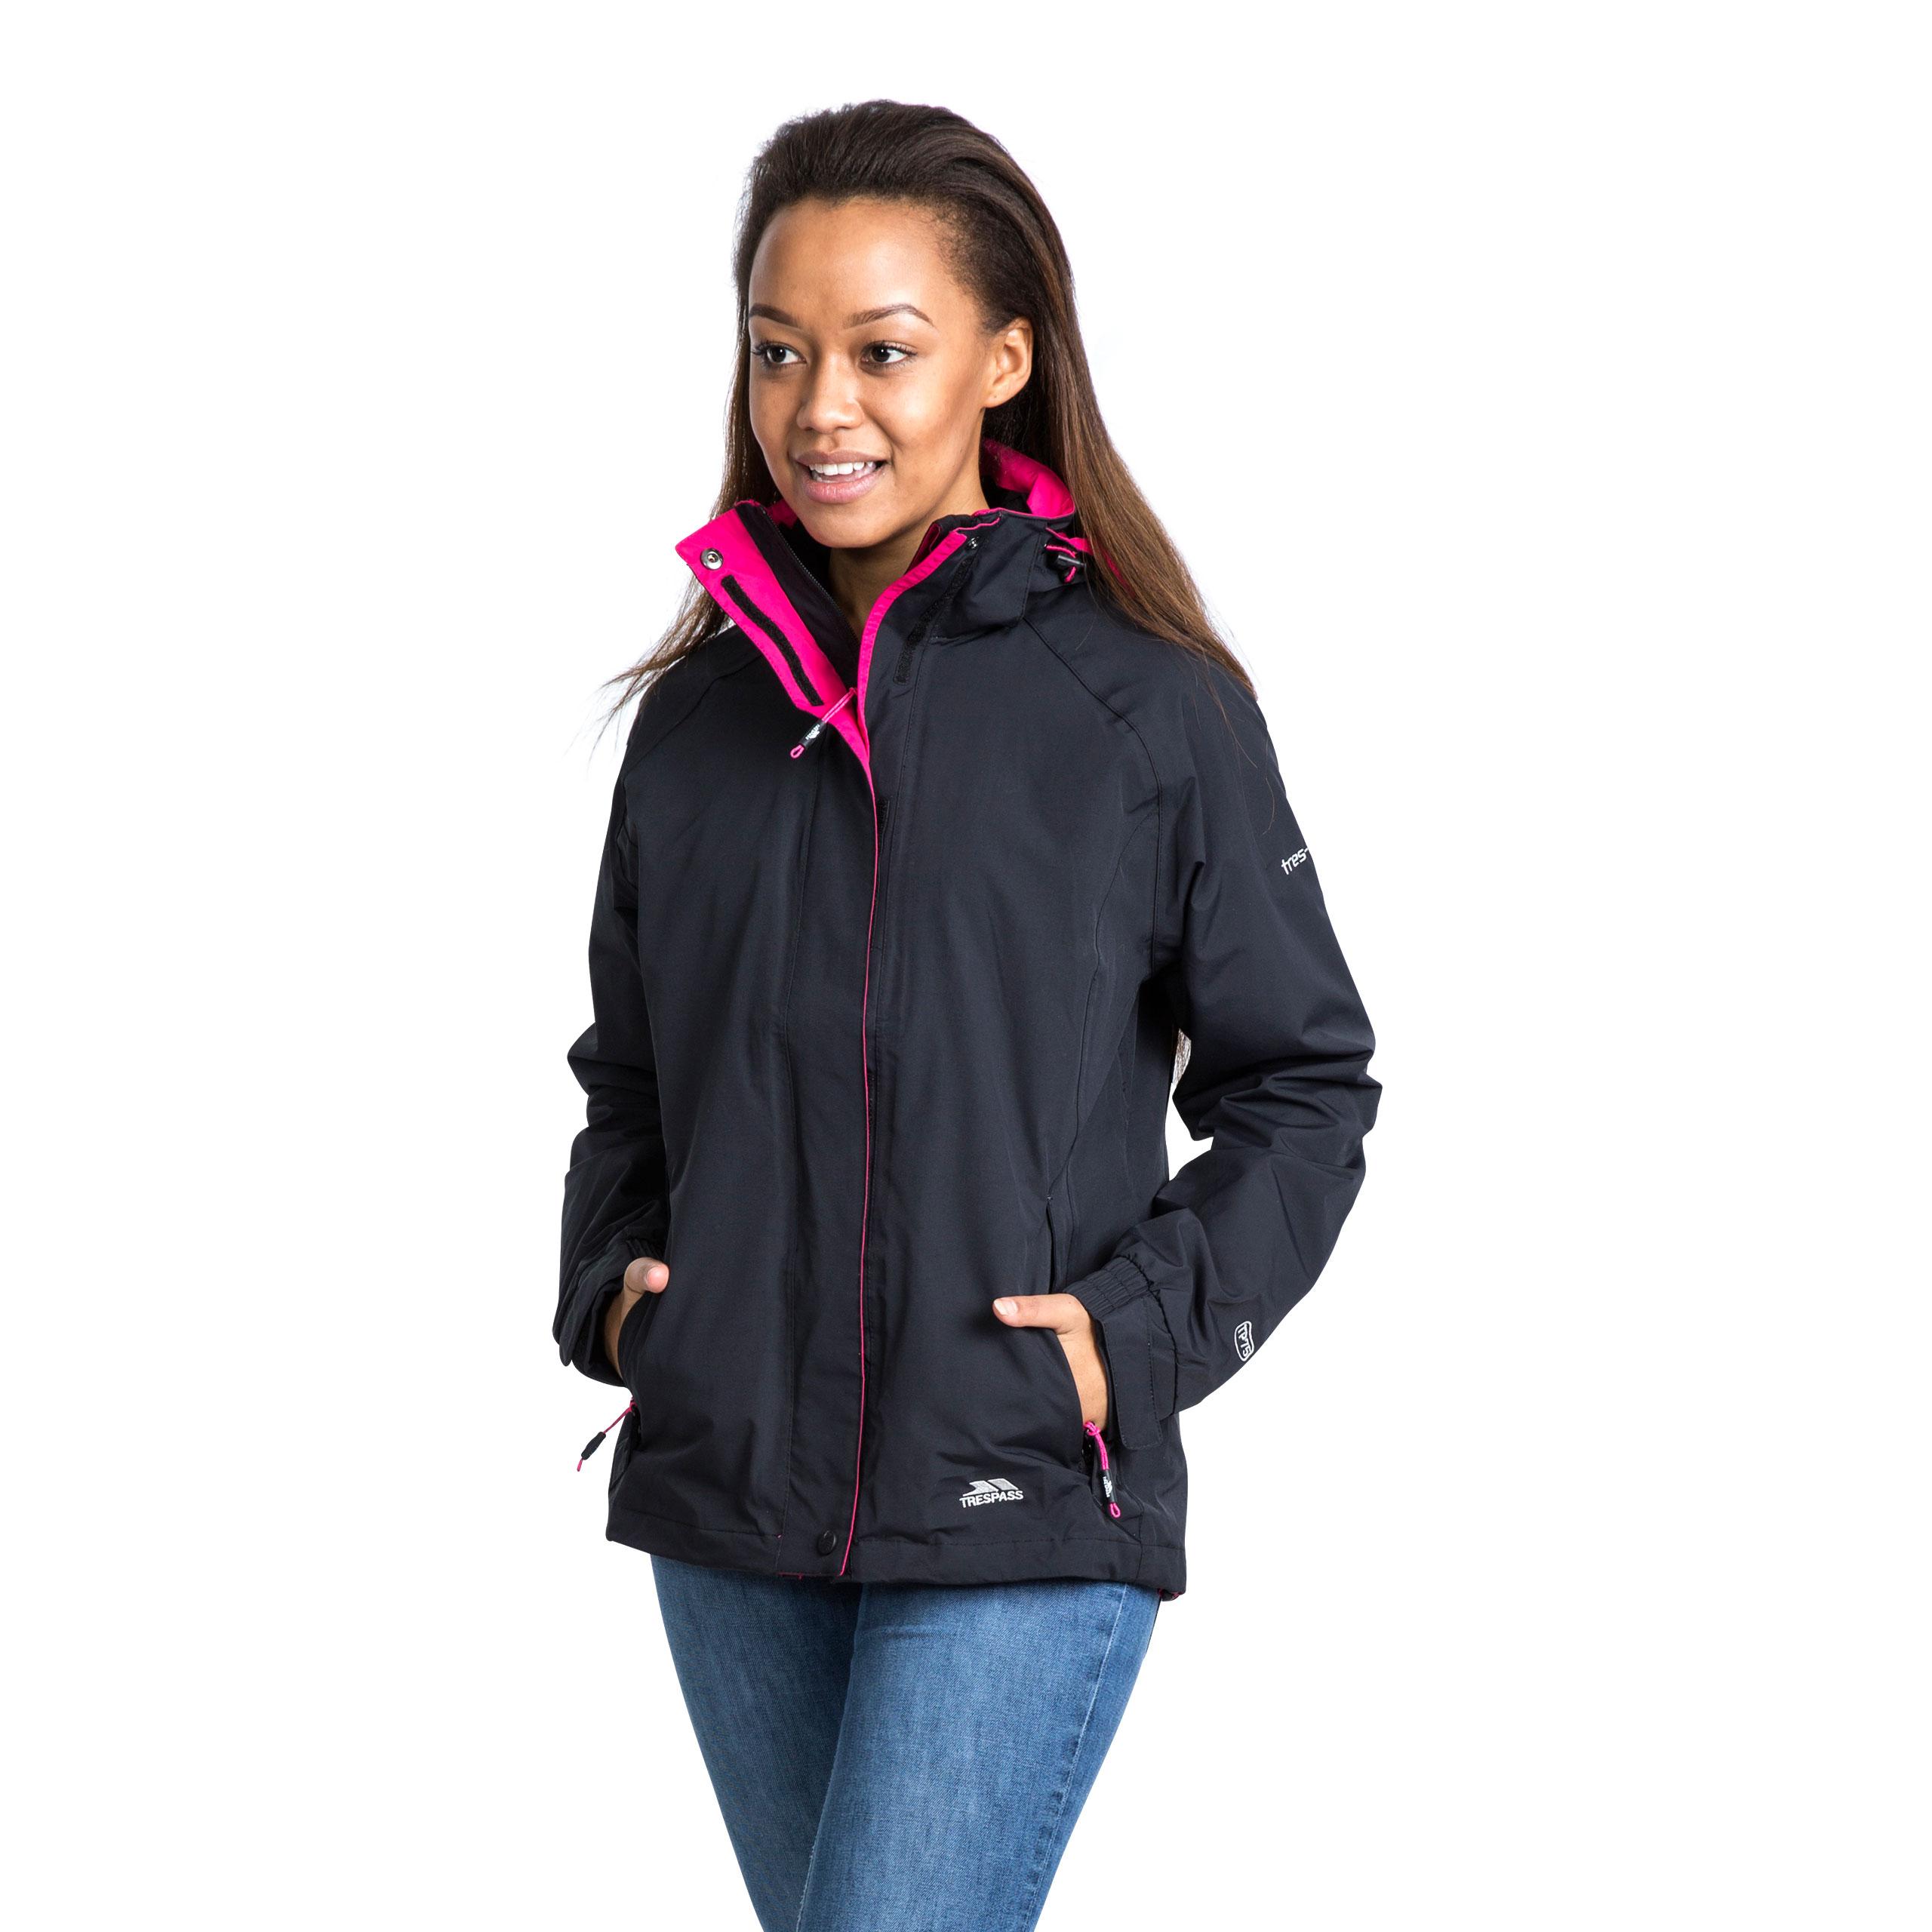 Trespass-Florissant-Womens-Waterproof-Jacket-Black-Navy-Rain-Coat-with-Hood miniatuur 15